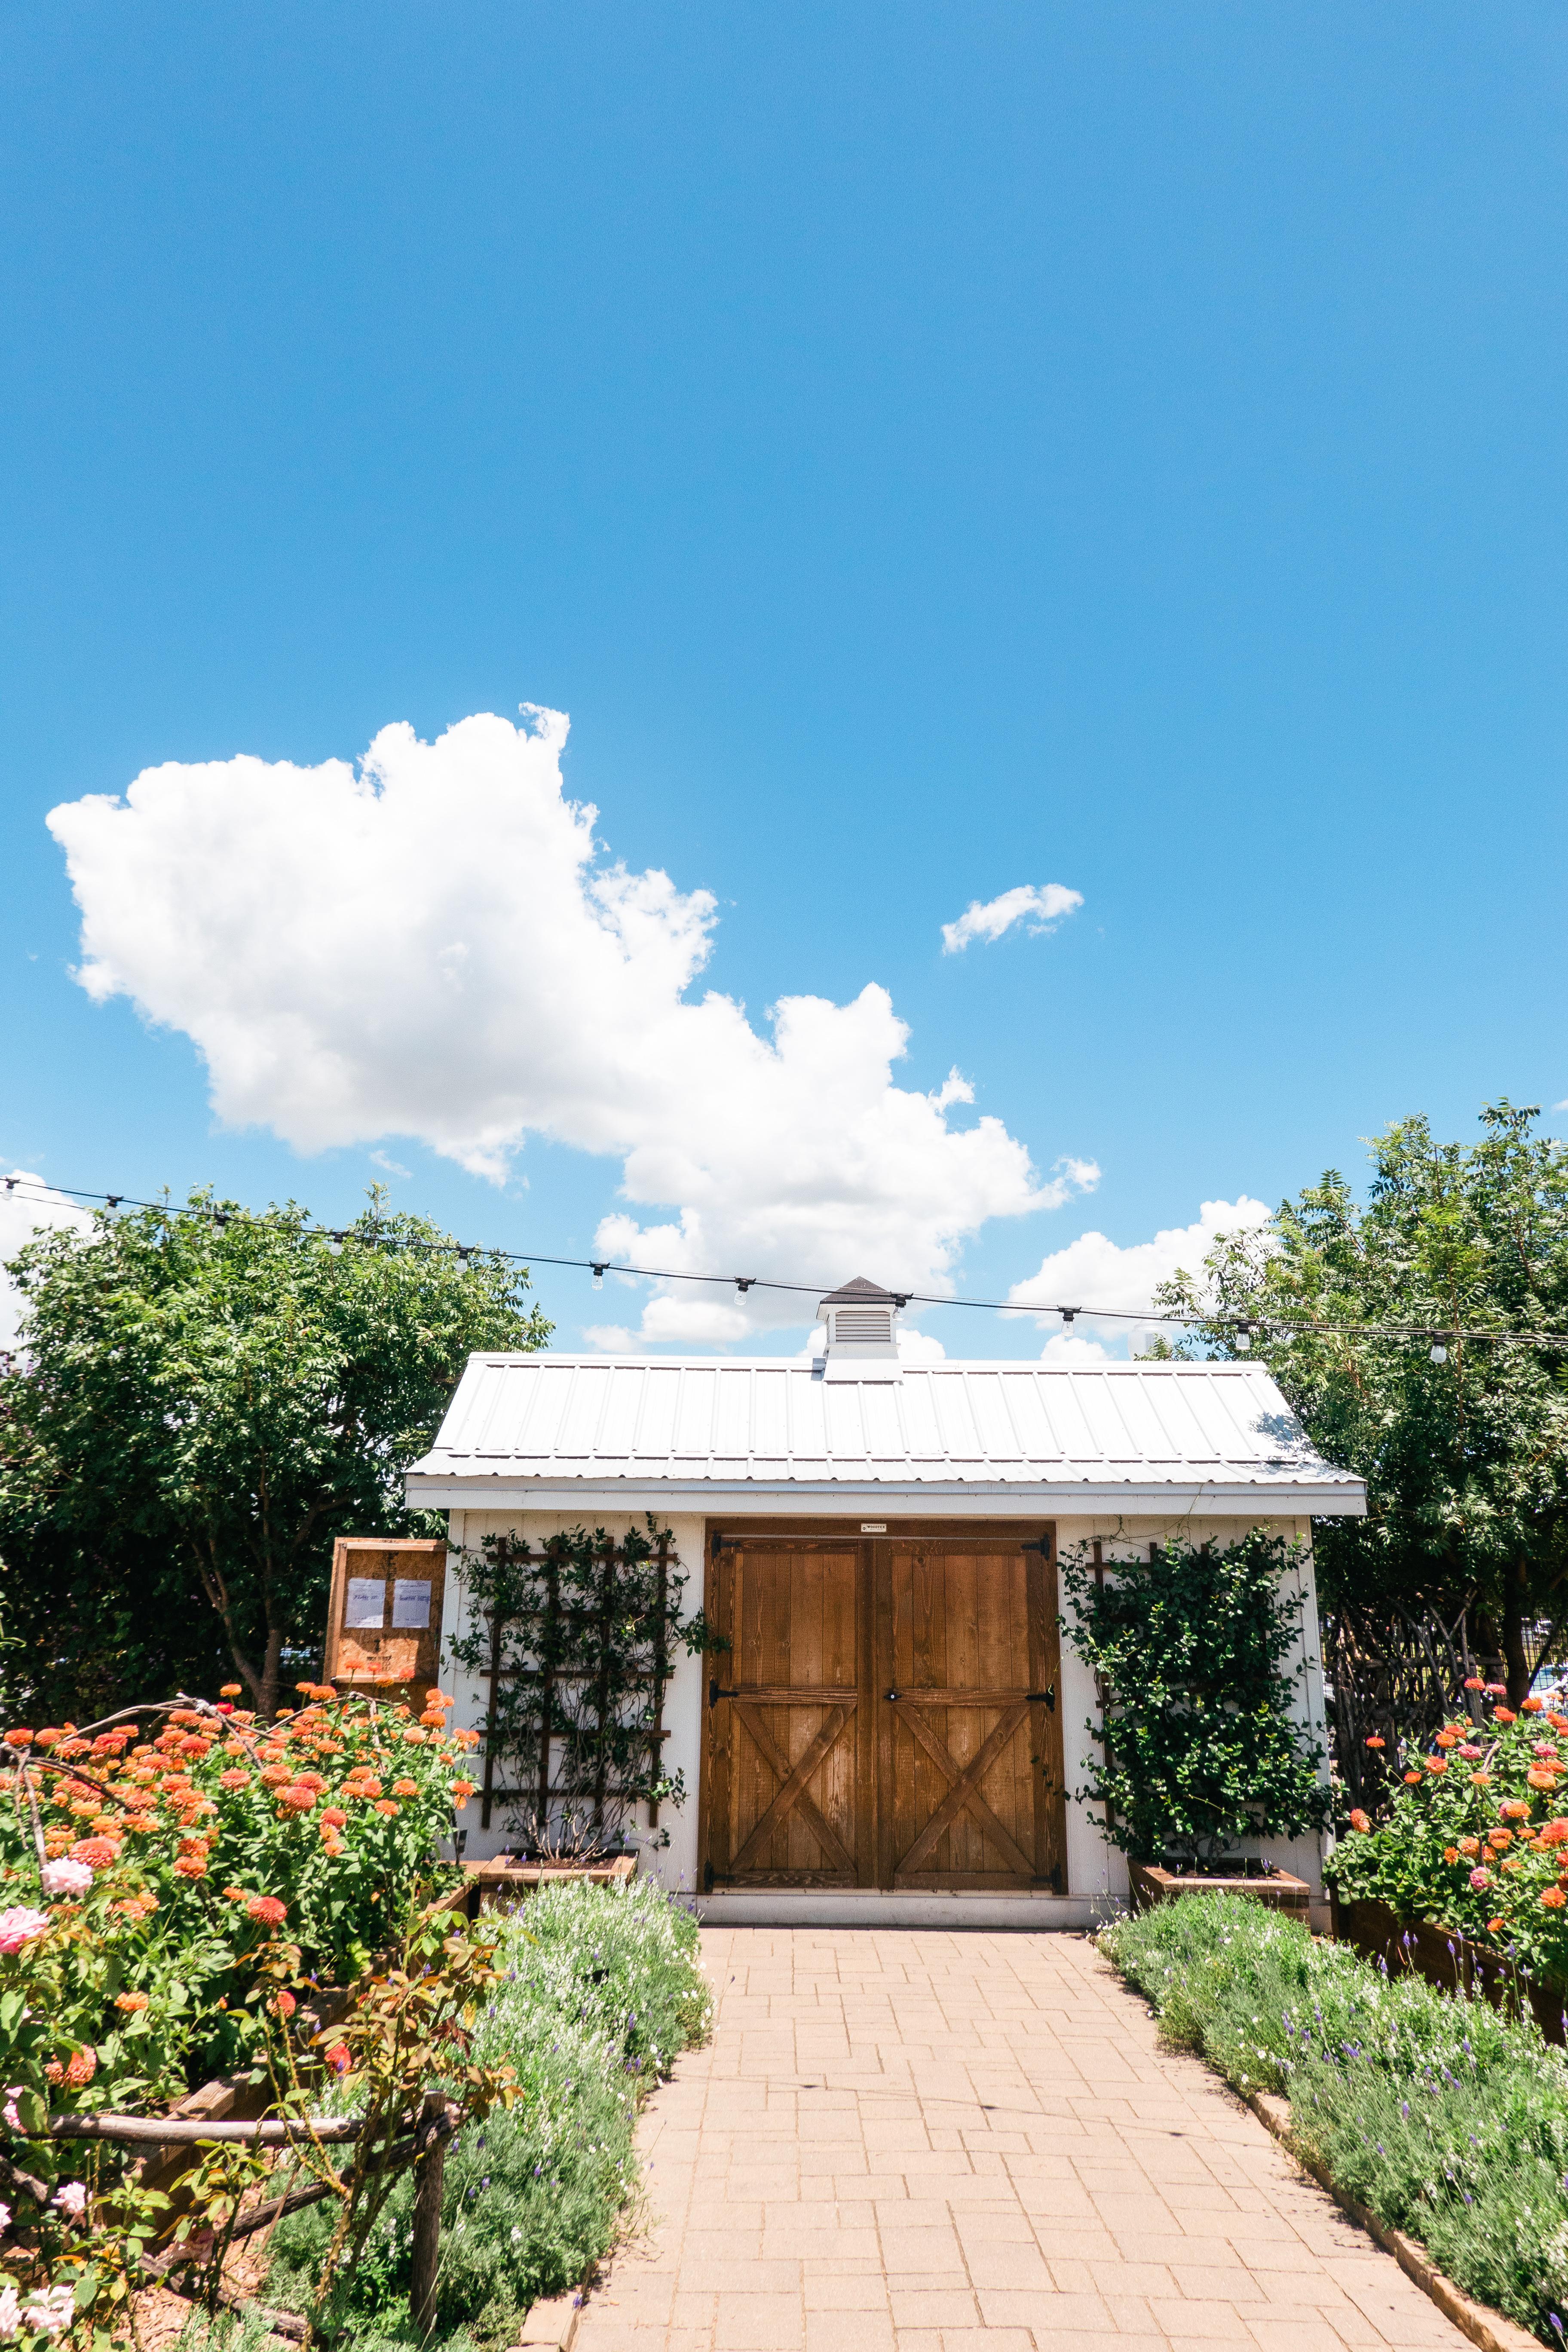 Magnolia Seed and Supply in Waco, Texas